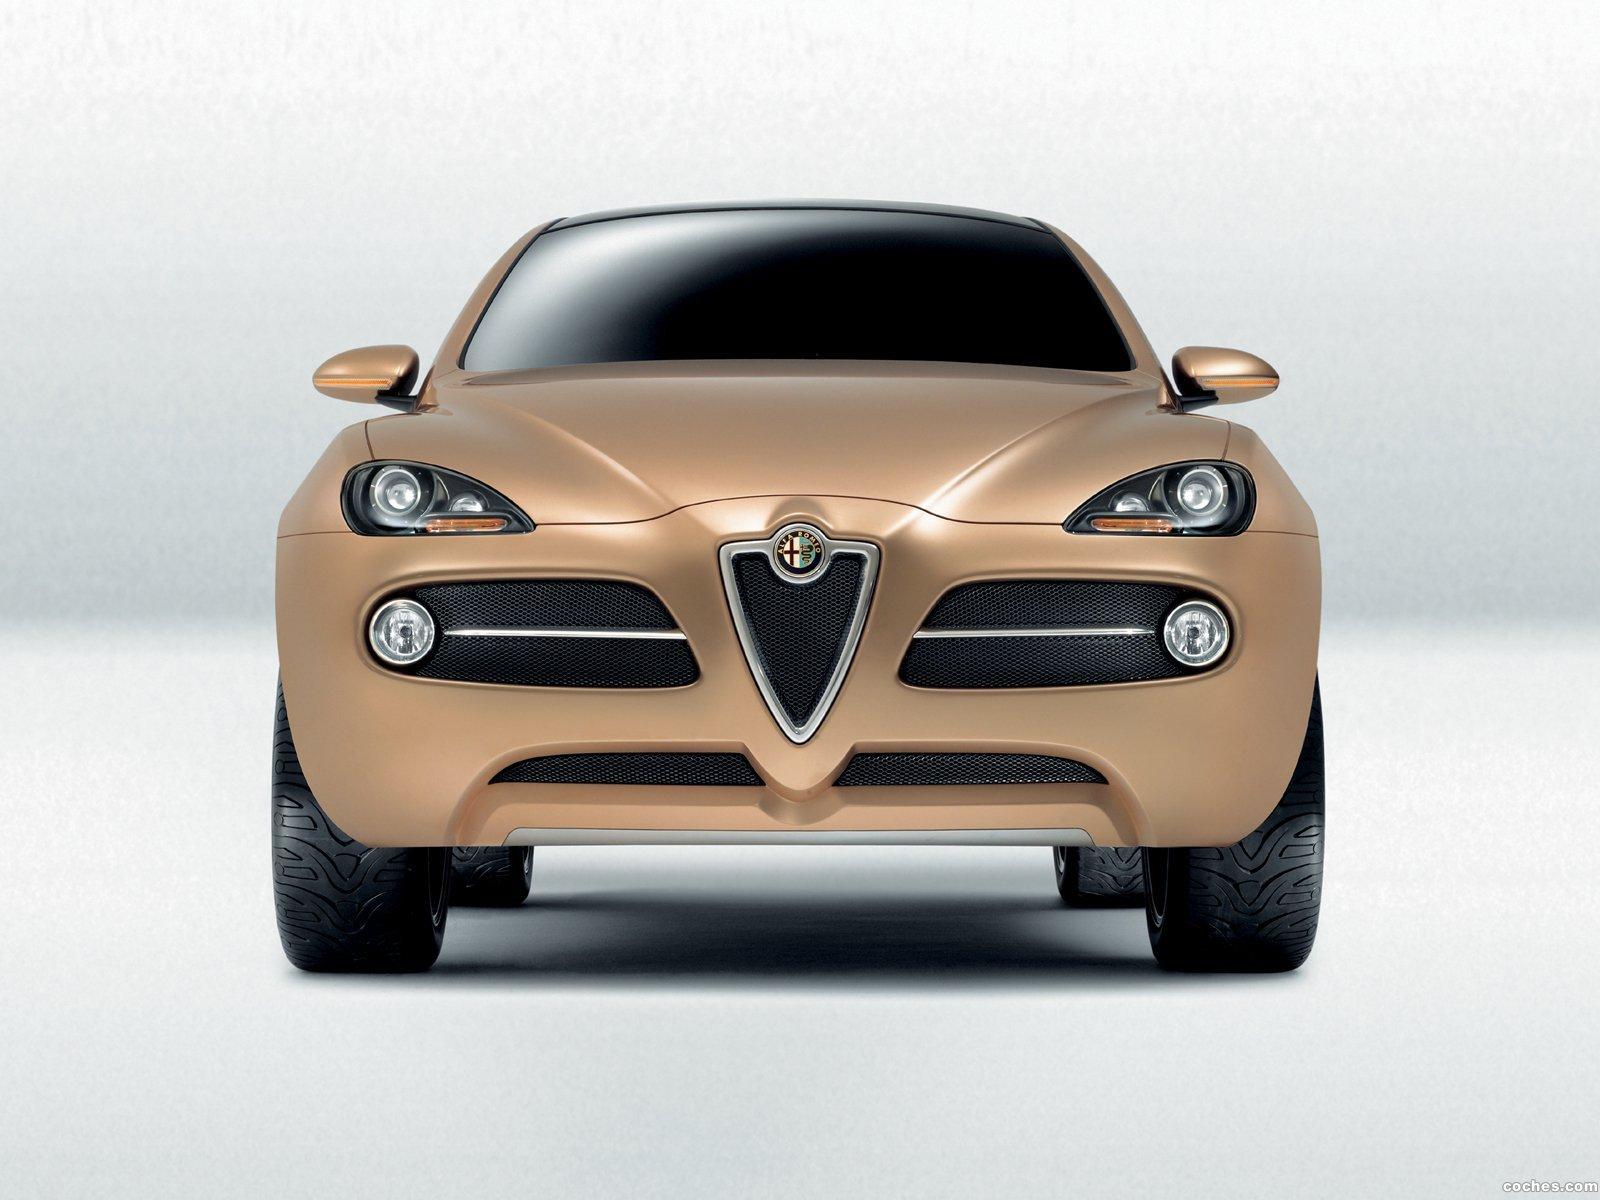 Foto 3 de Alfa Romeo Kamal Concept 2003